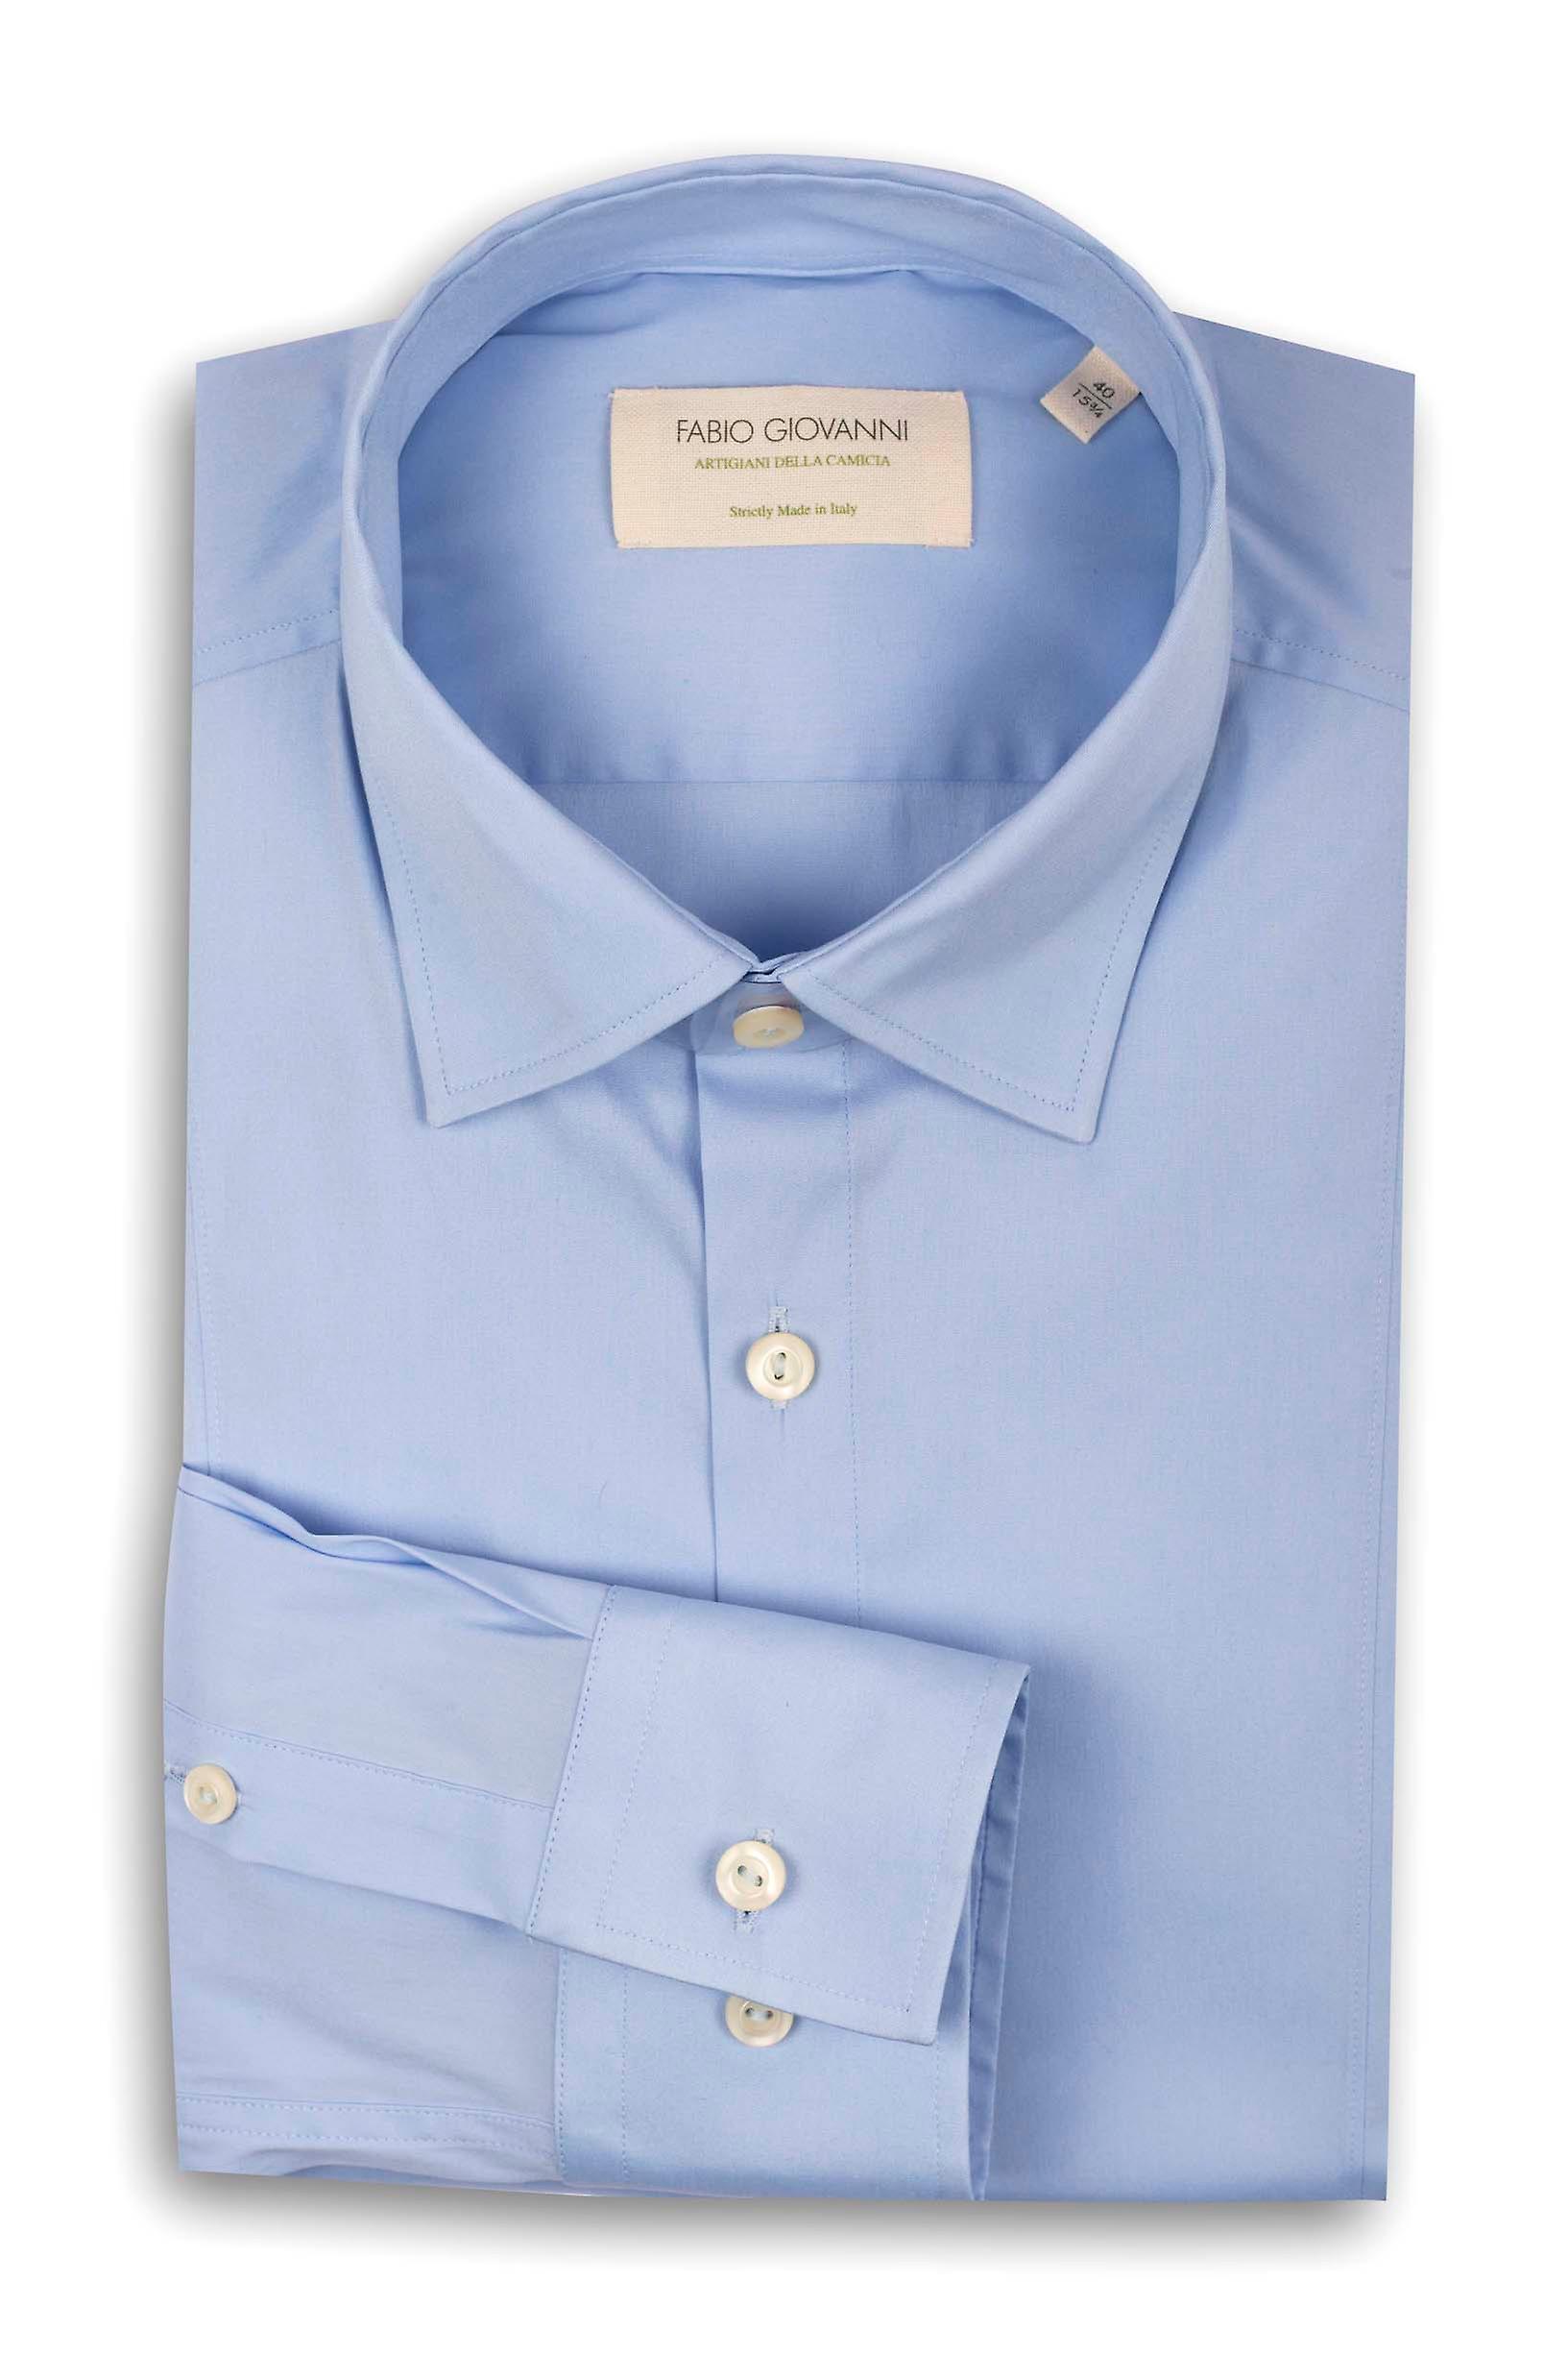 Fabio Giovanni San Vito Shirt - Mens High Quality Italian Poplin Cotton Light Blue Plain Shirt